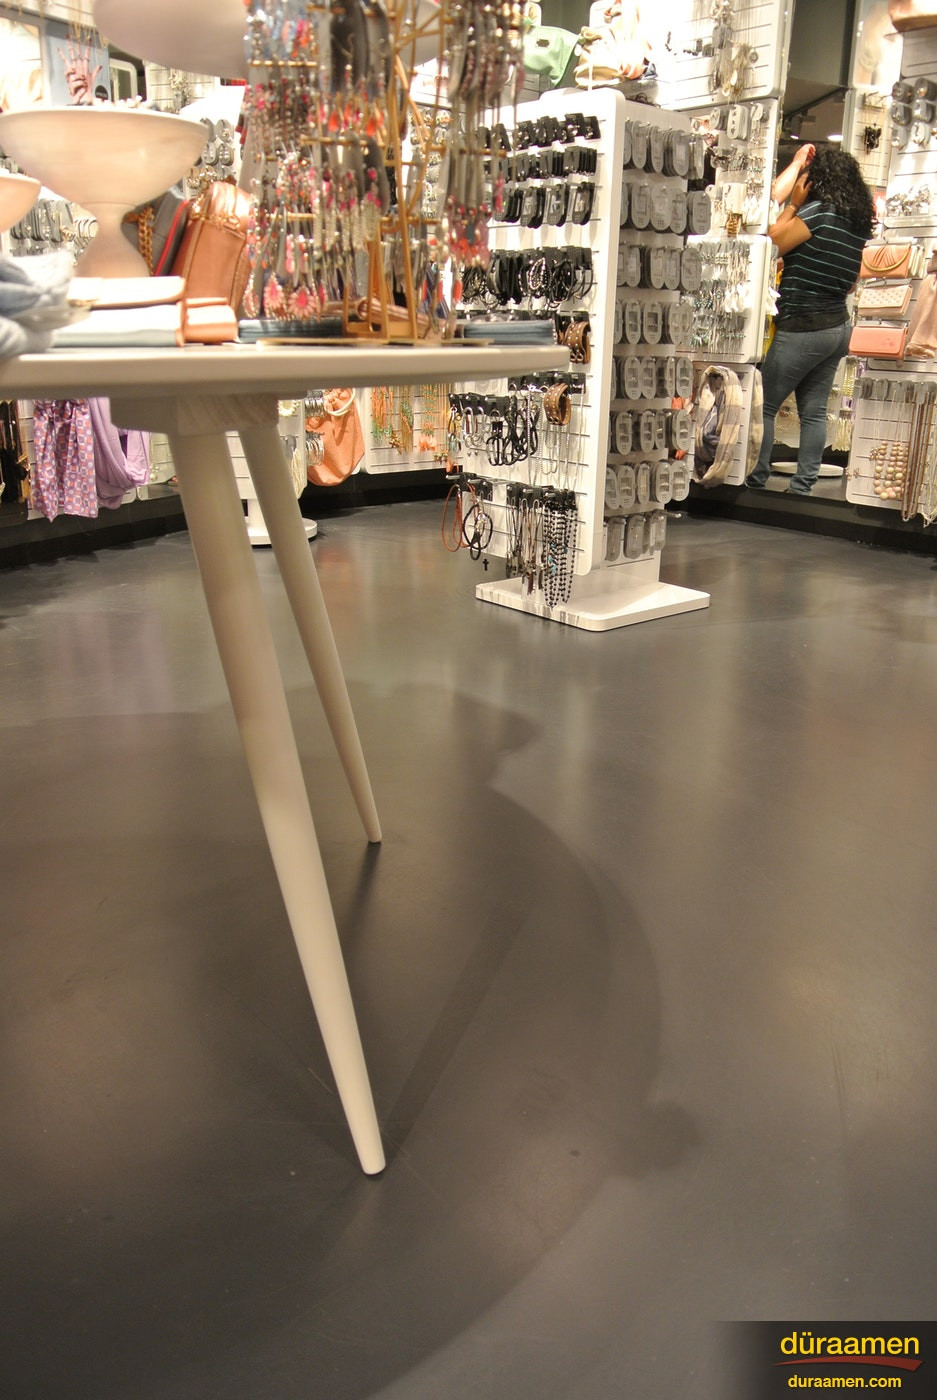 hardwood floors paramus nj of six a jewelry store in paramus nj duraamen regarding the matt polyurethane top coat was the perfect finish to contrast the high shine of the stores interior